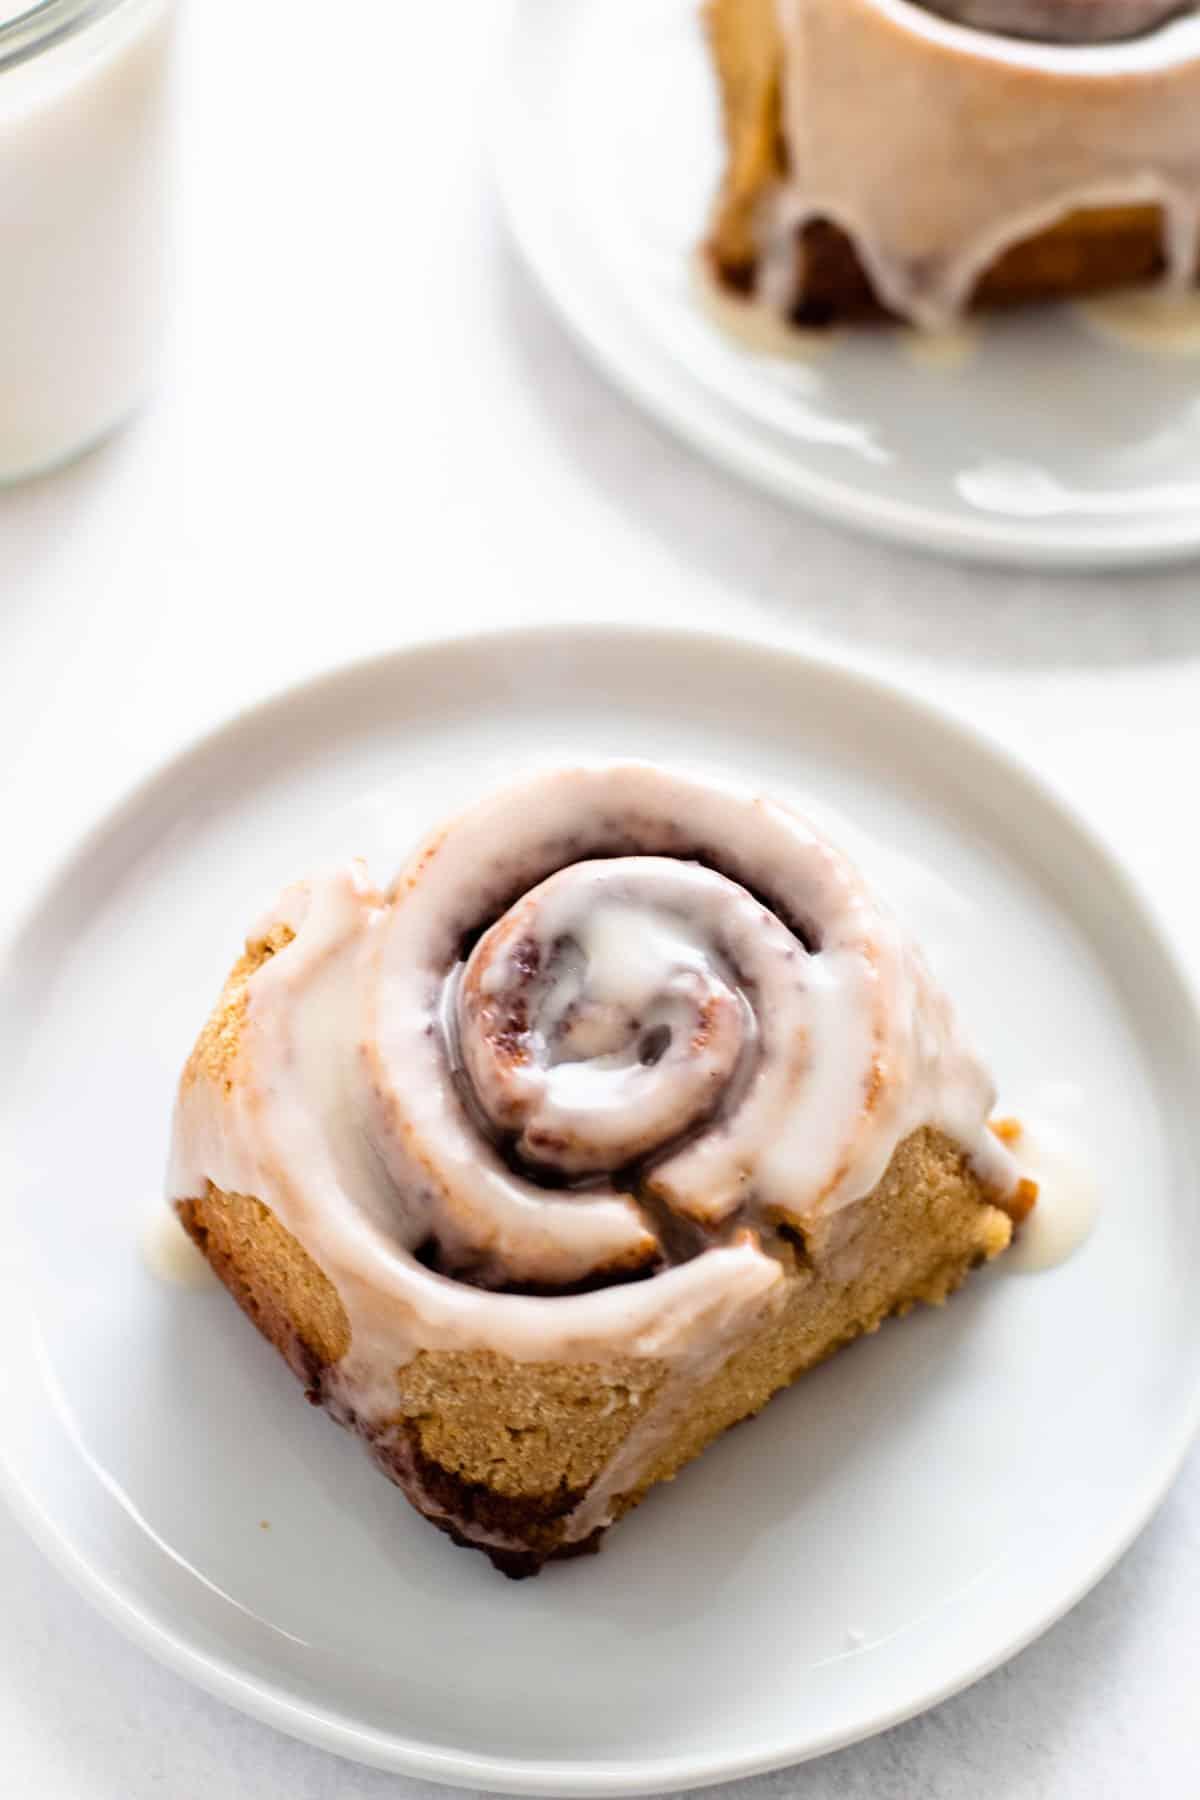 A gluten-free cinnamon roll on a plate.